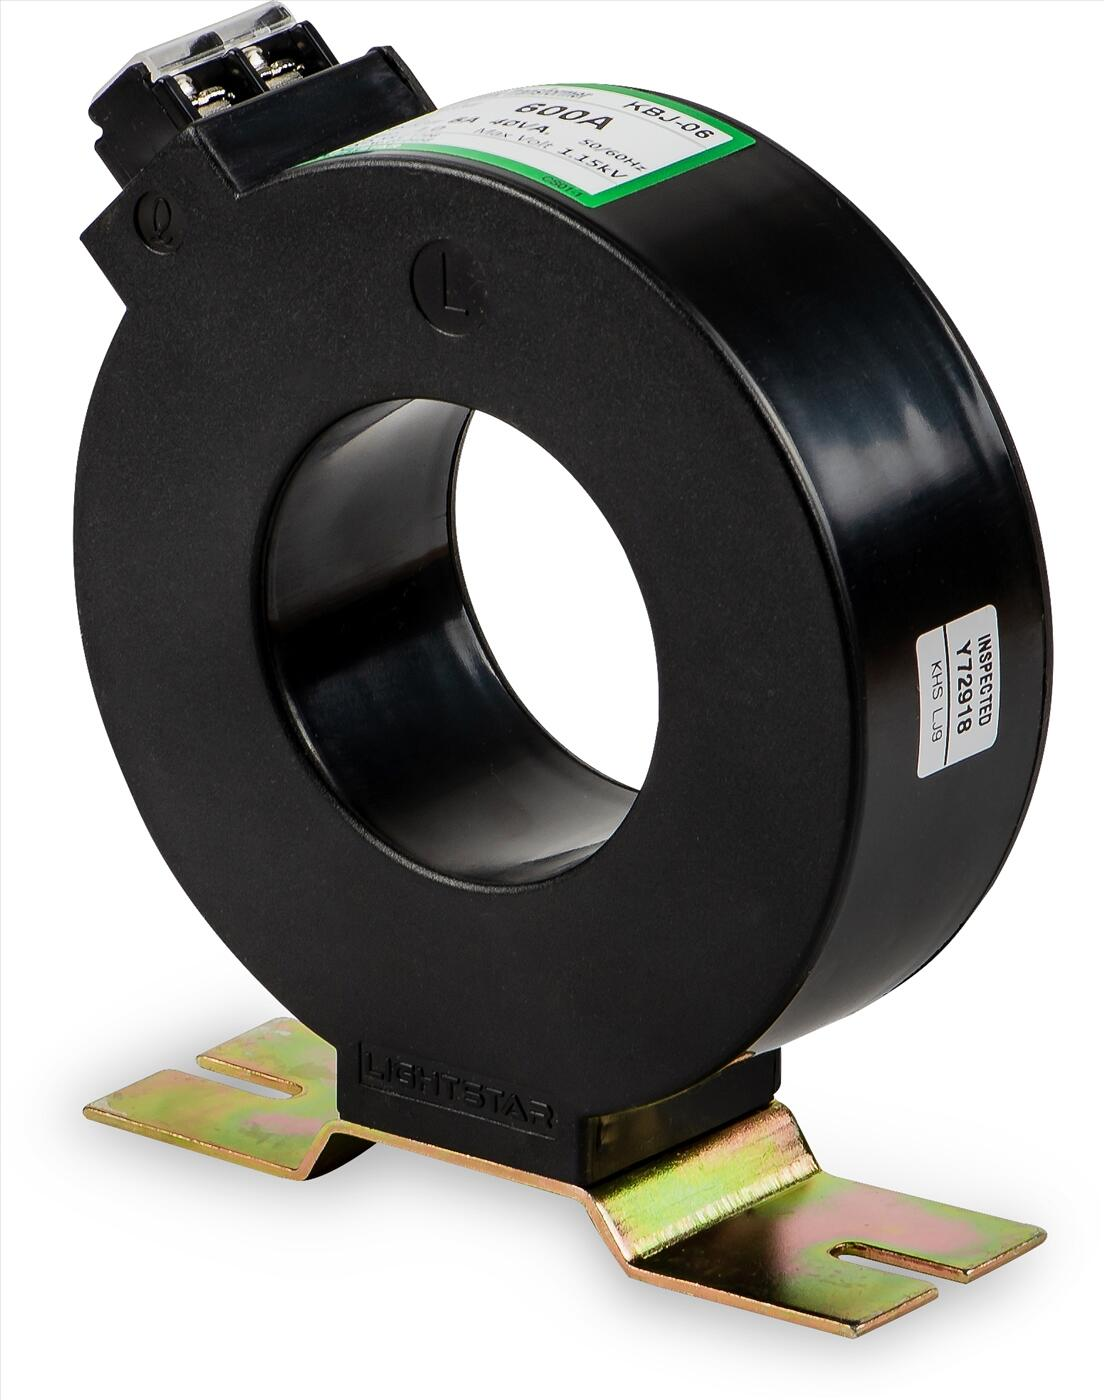 Biến dòng bảo vệ KBJ-06 (1200/5A,1500/5A,1600/5A,2000/5A,3000/5A)